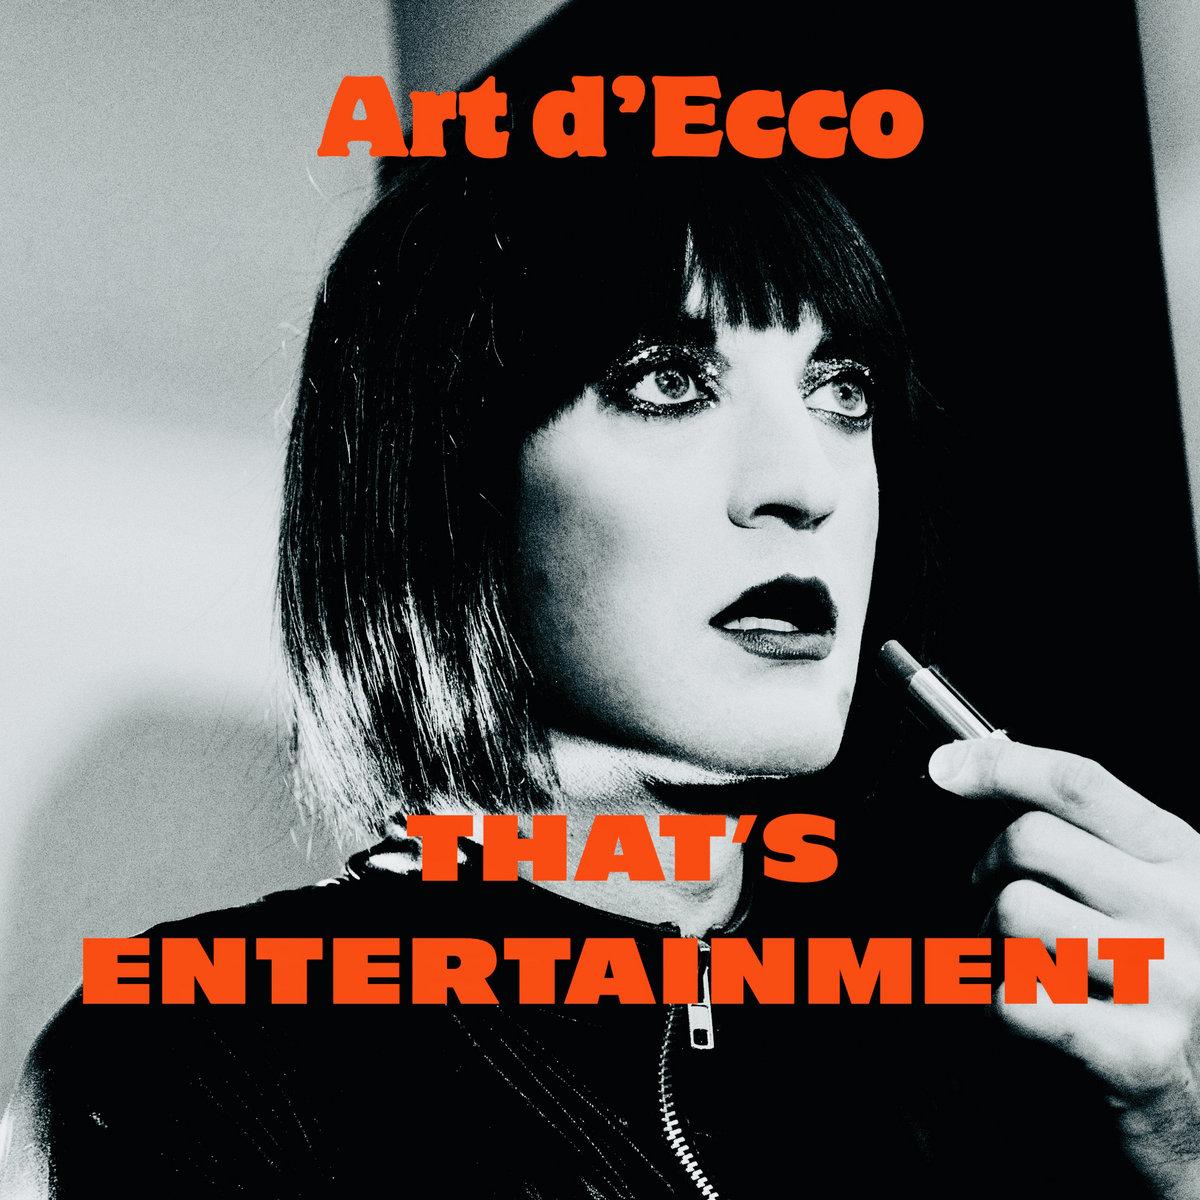 News – Art d'Ecco – That's Entertainment (The Jam cover)